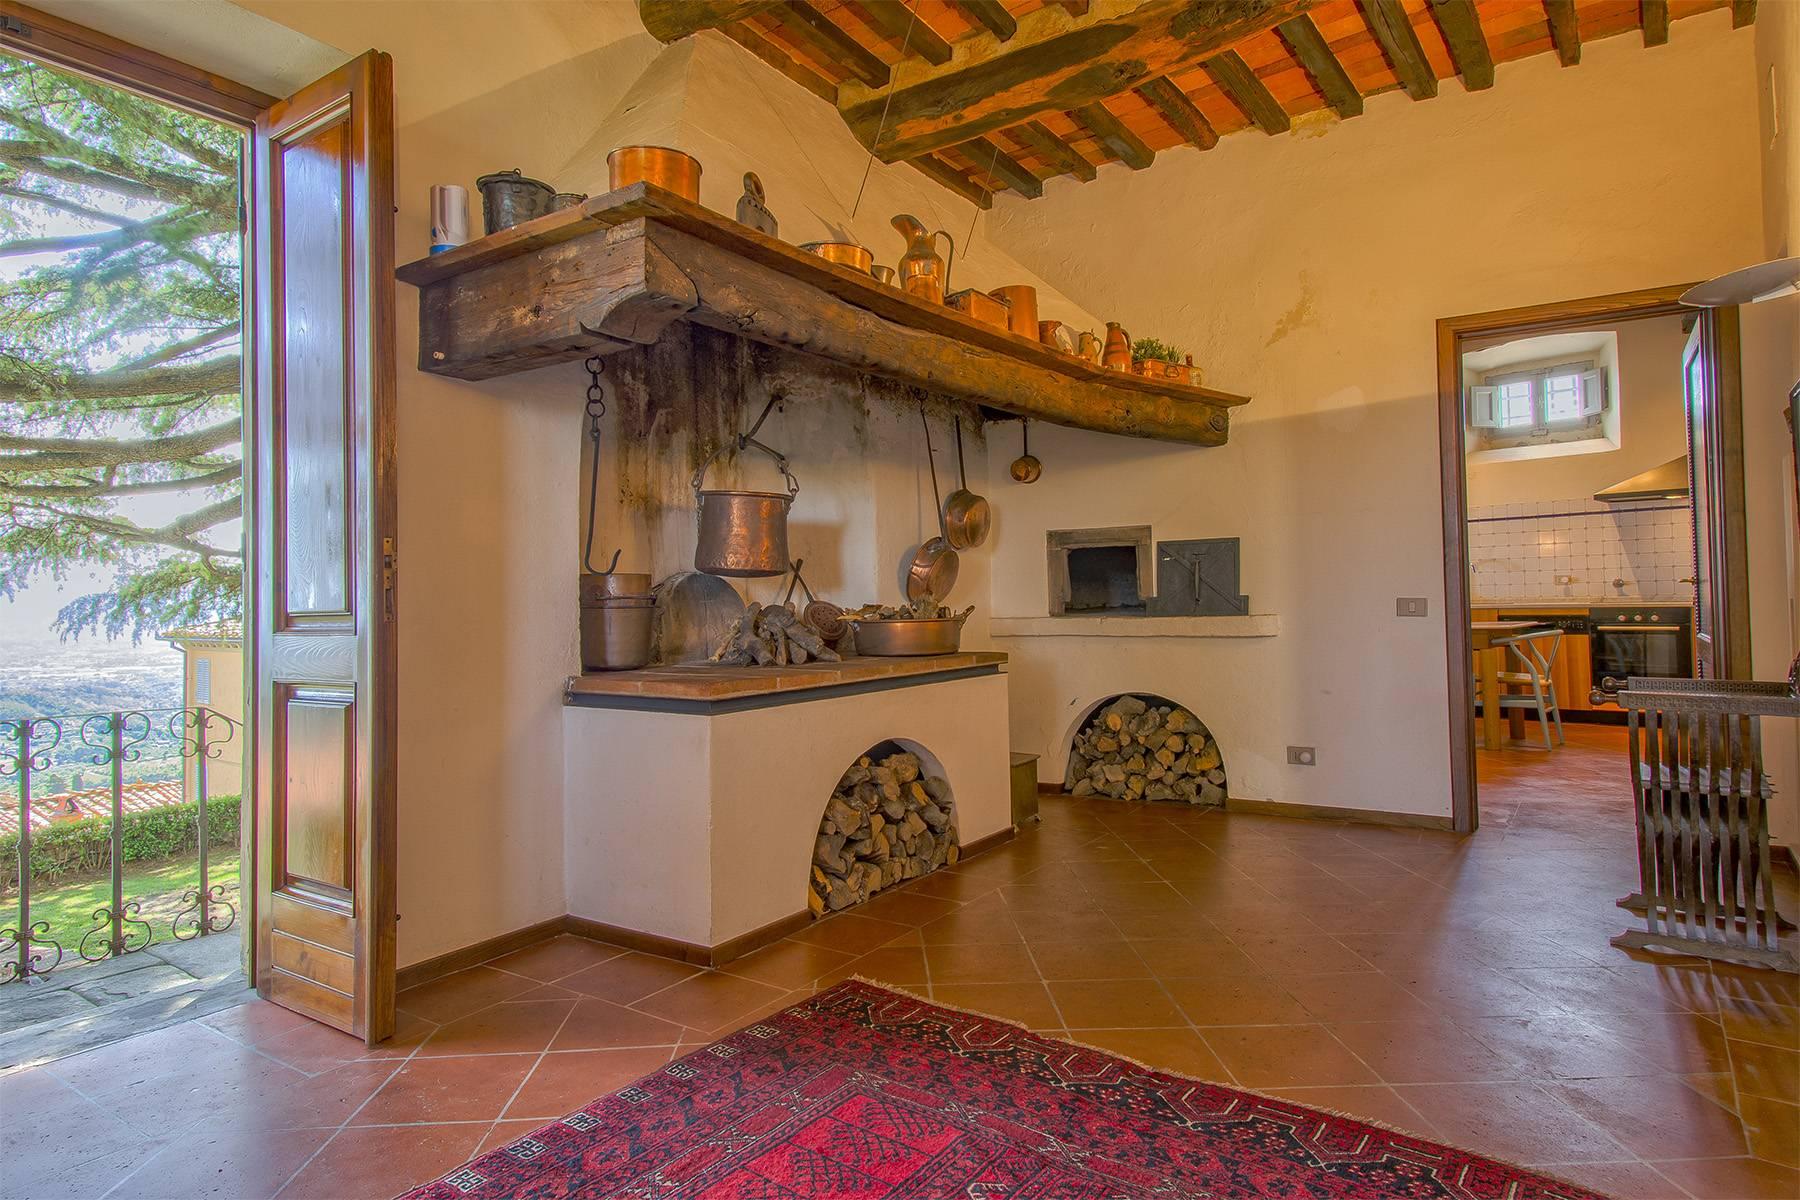 Villa in Vendita a Capannori: 5 locali, 380 mq - Foto 9